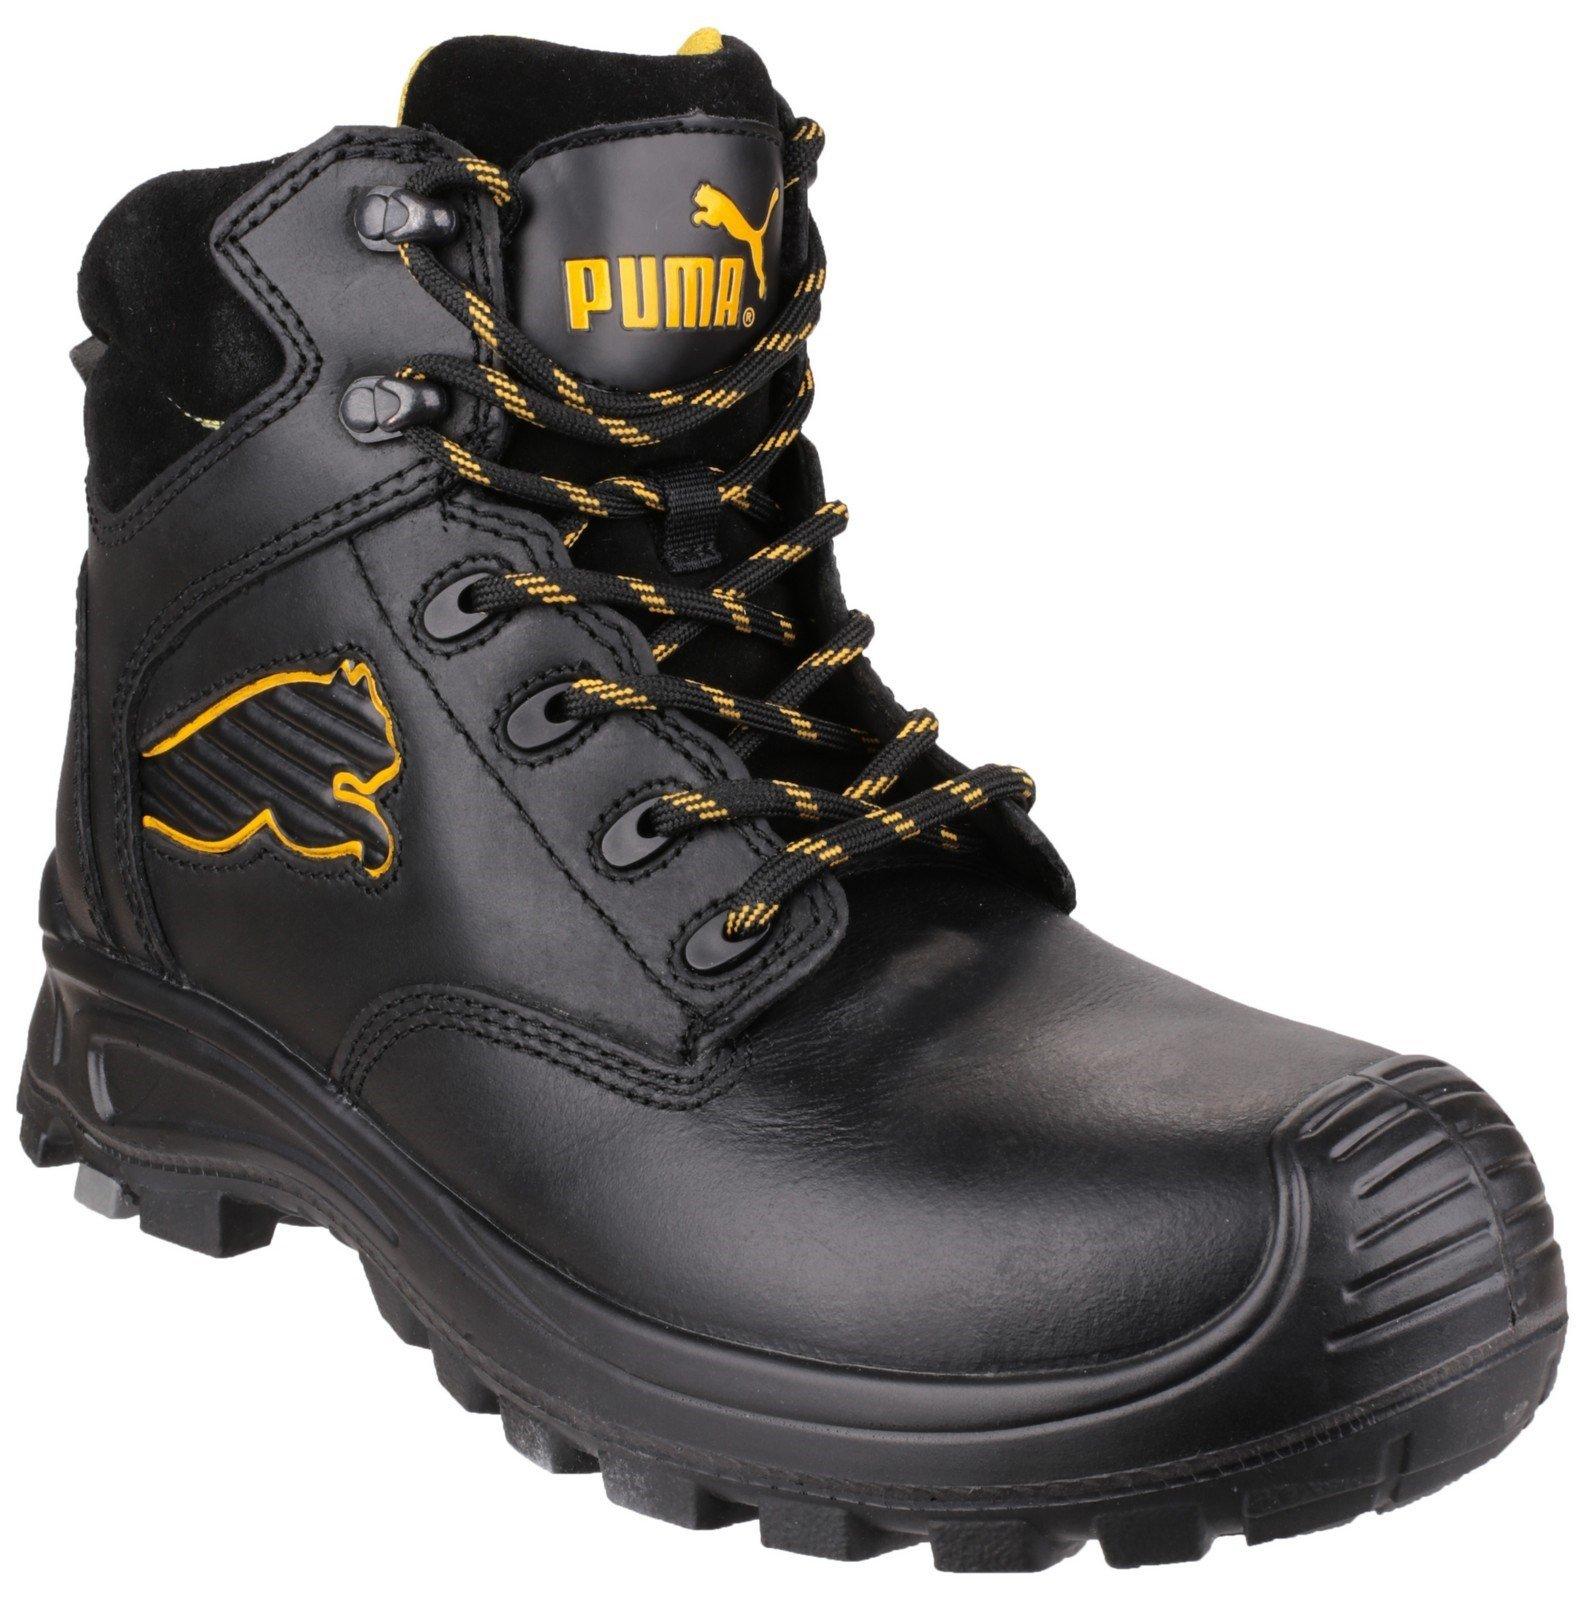 Puma Safety Unisex Borneo Mid S3 Boot Black 23086 - Black 6